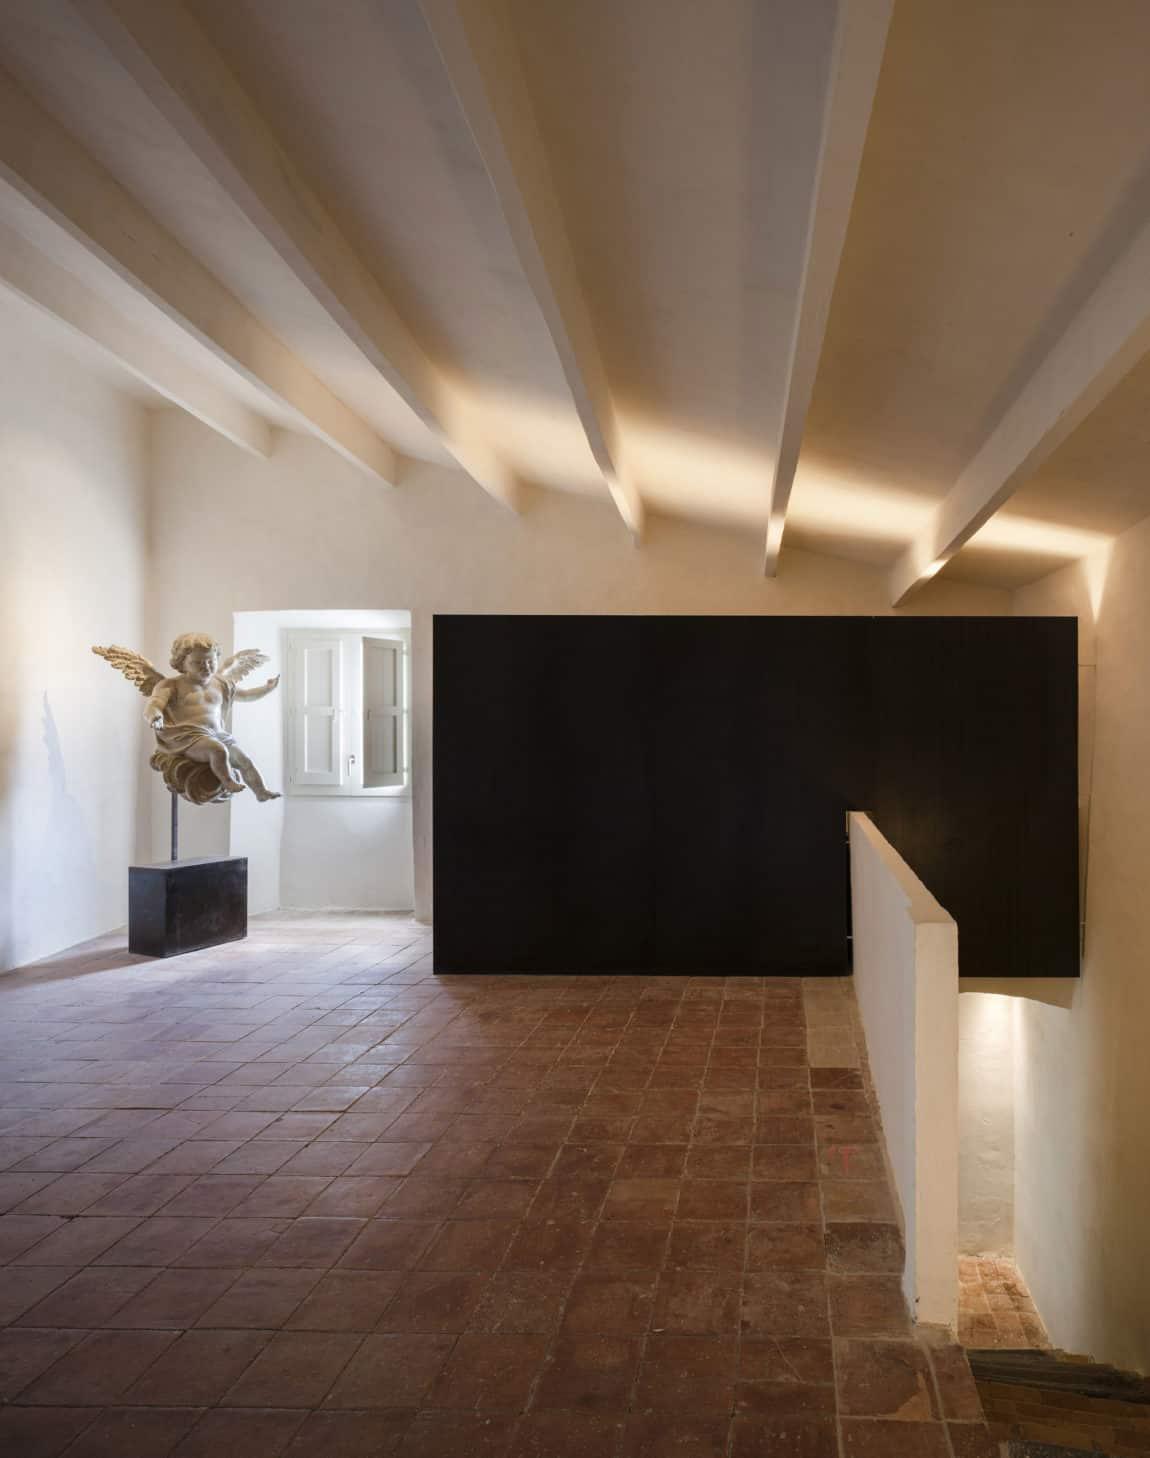 House in L'Empordà by Francesc Rifé Studio (16)